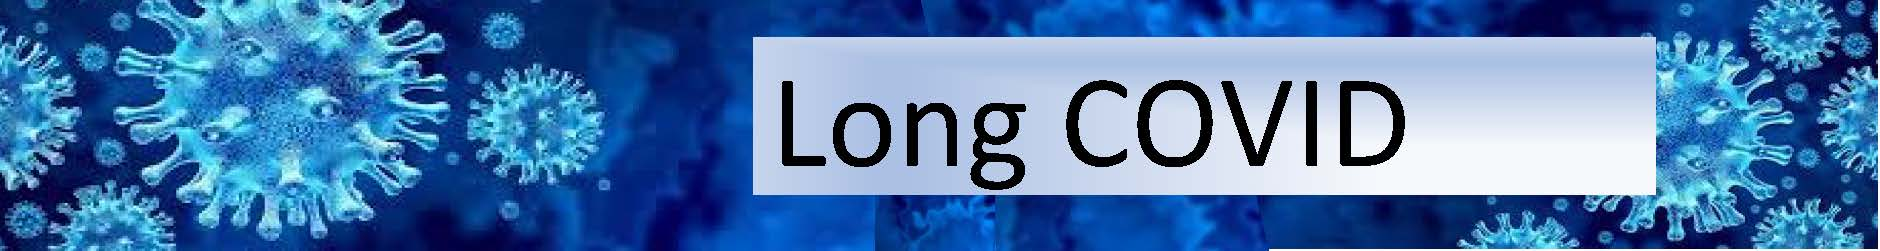 Long COVID Banner